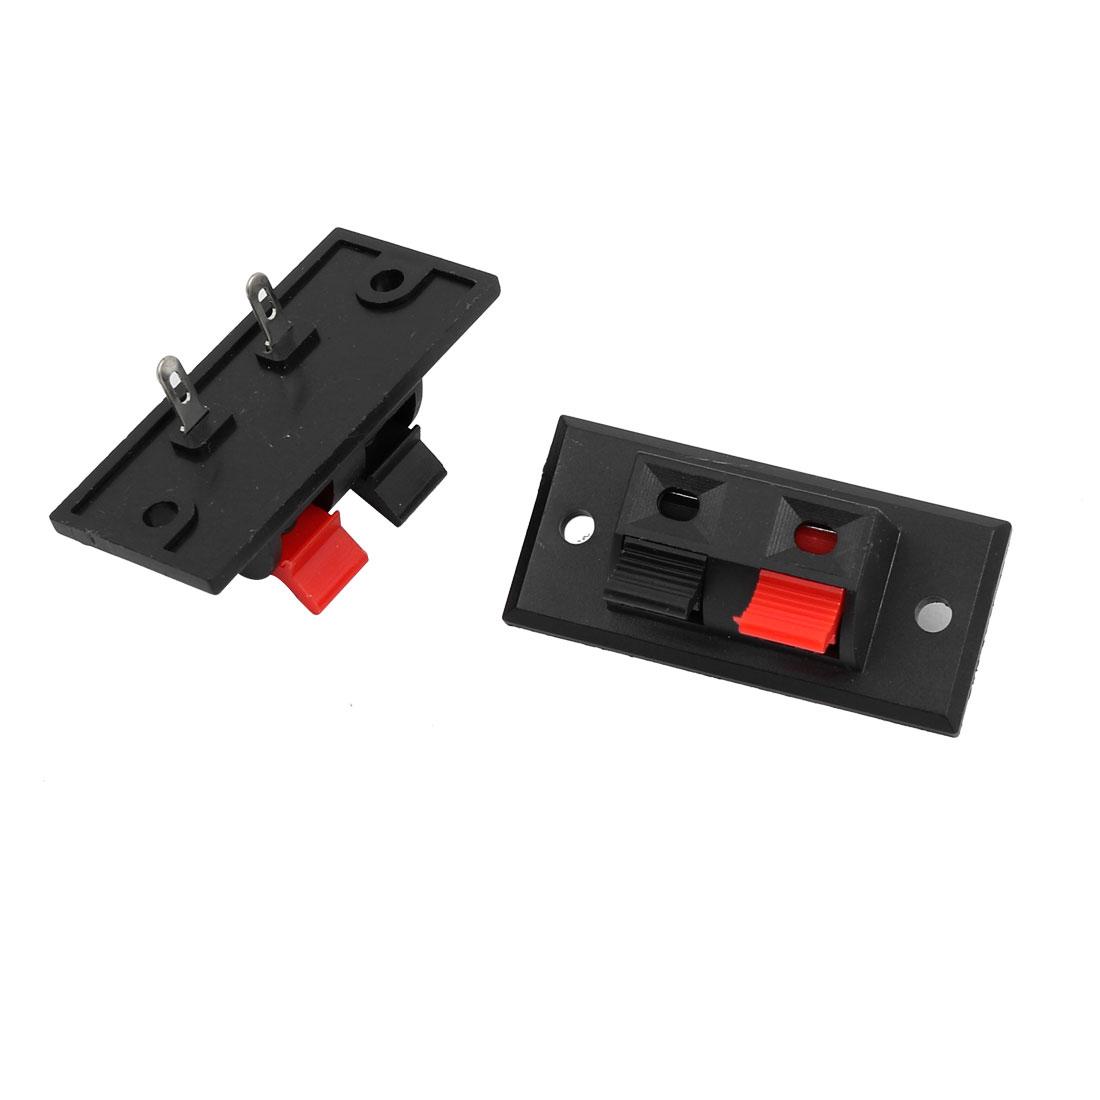 2 Pcs Single Row 1 Red 1 Black 2 Position Push Type Speaker Terminals